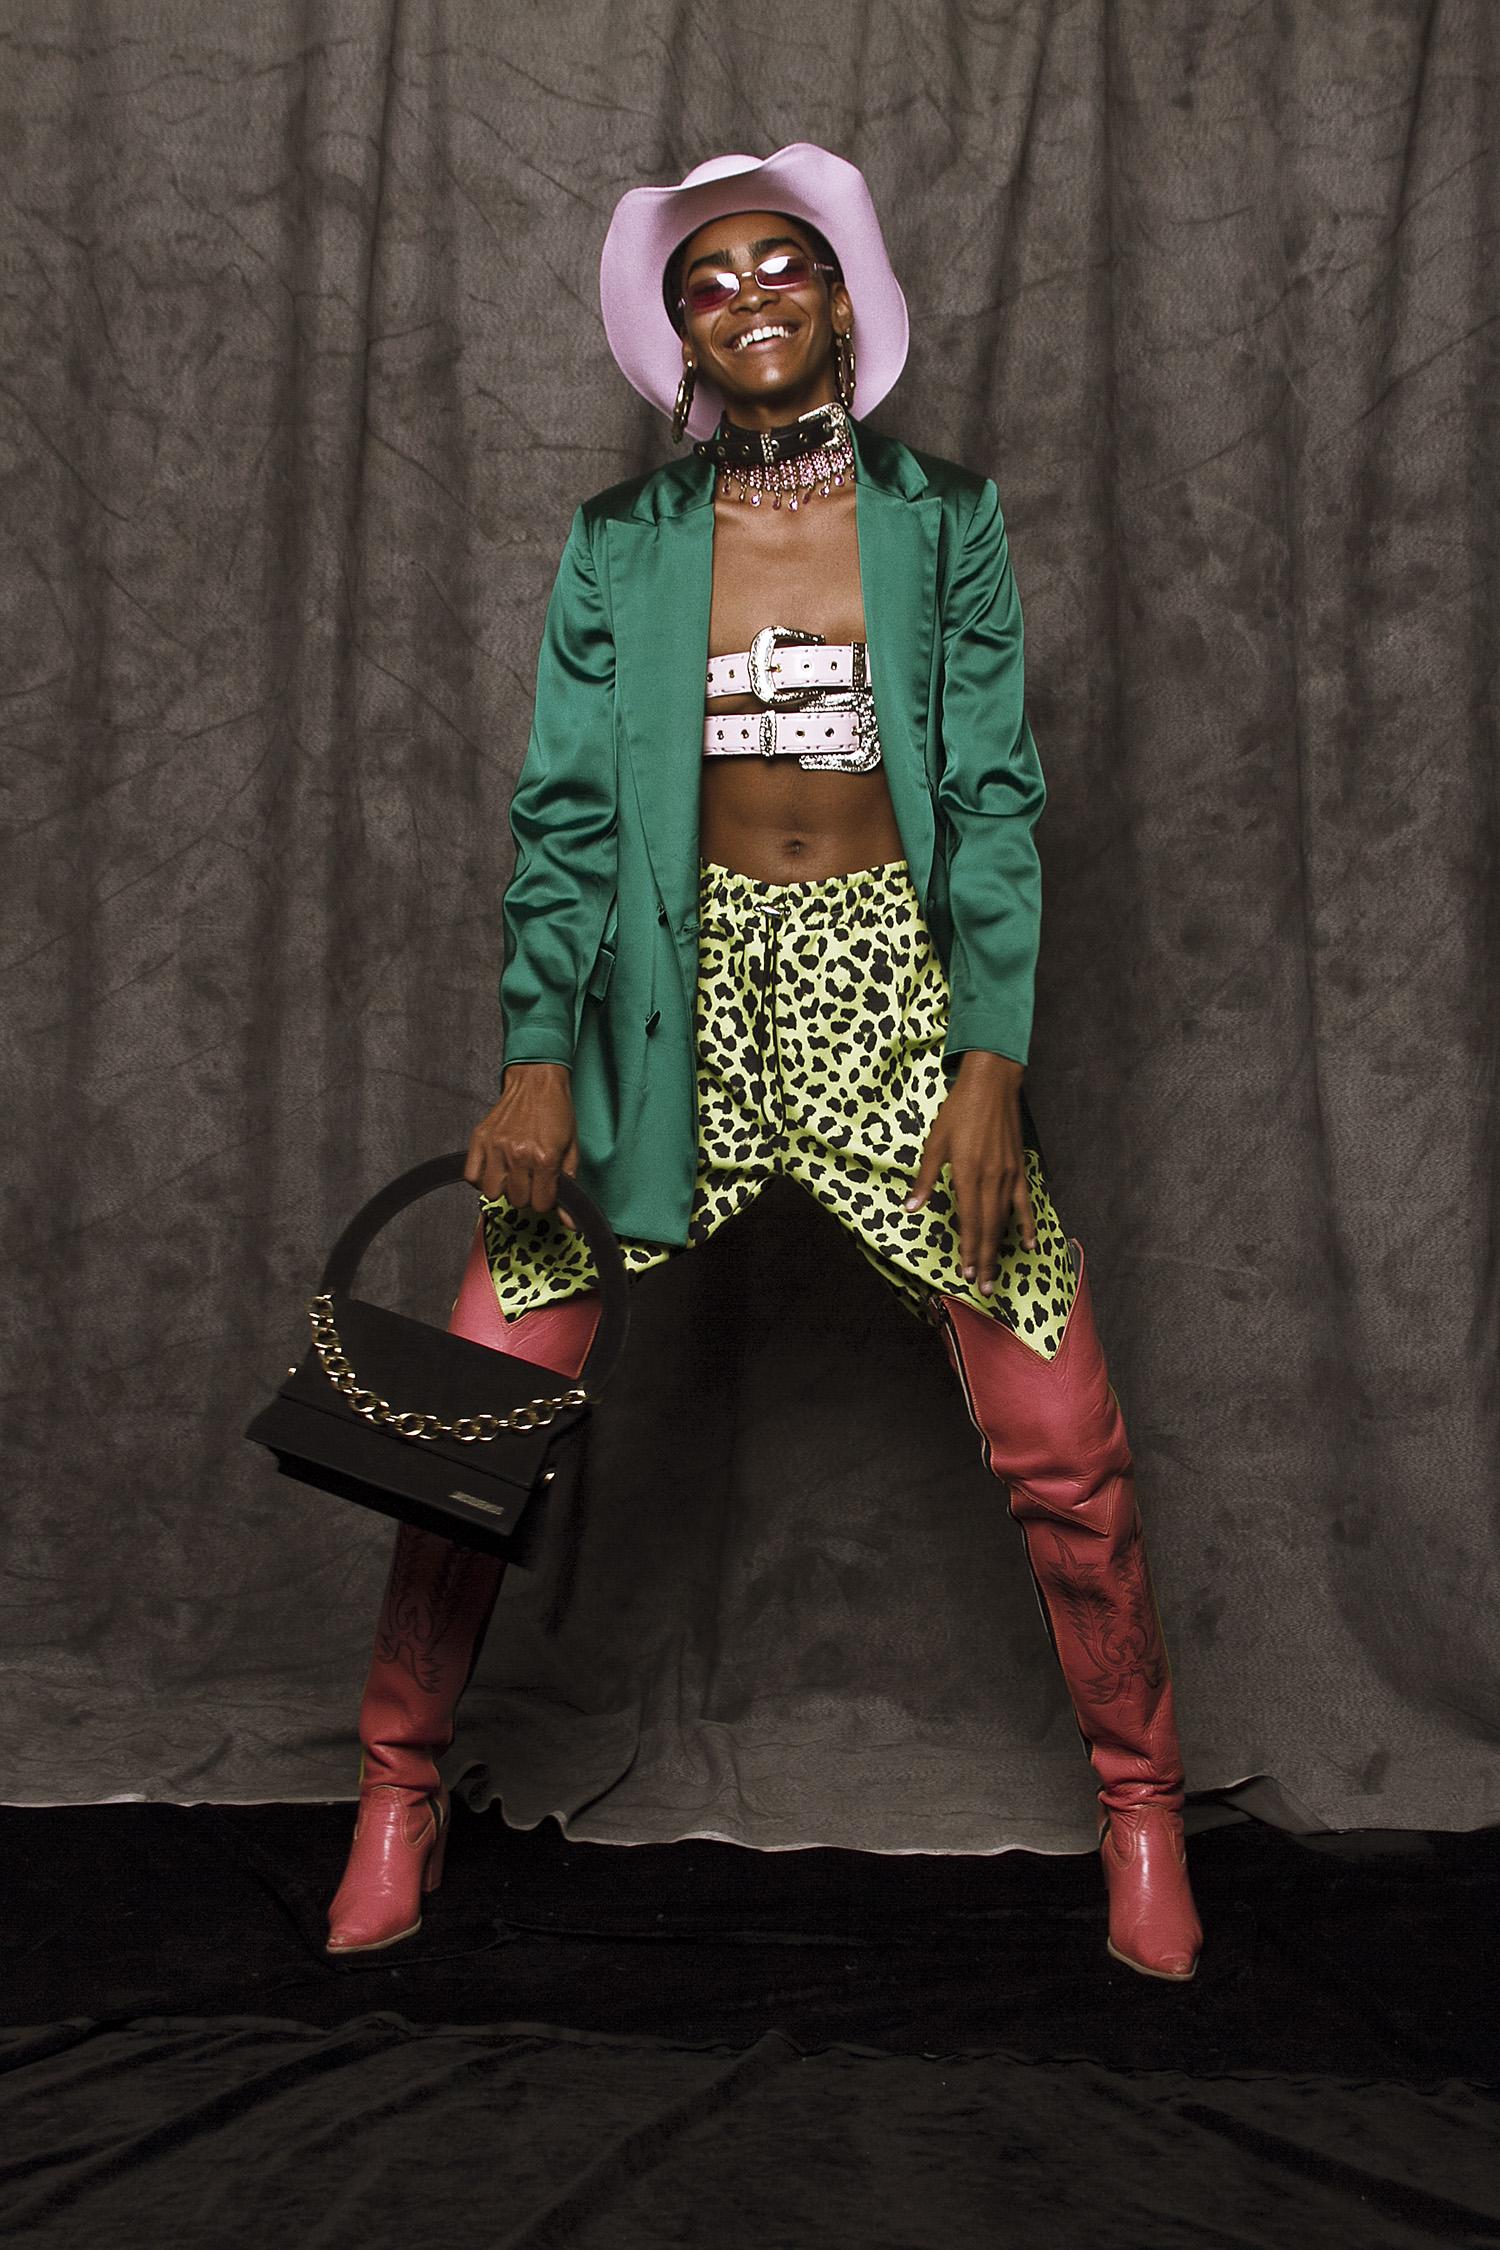 Blazer verde  Uterque,  cinturones vaqueros como top  NDA,  joggers de animal print  Forever 21,  botas rosas  AINT,  sombrero vaquero de la estilista, bolsa negra  Jacquemus,  choker negro  Zara,  choker rosa de la estilista, aretes  Forever 21,  lentes rosas de la estilista.